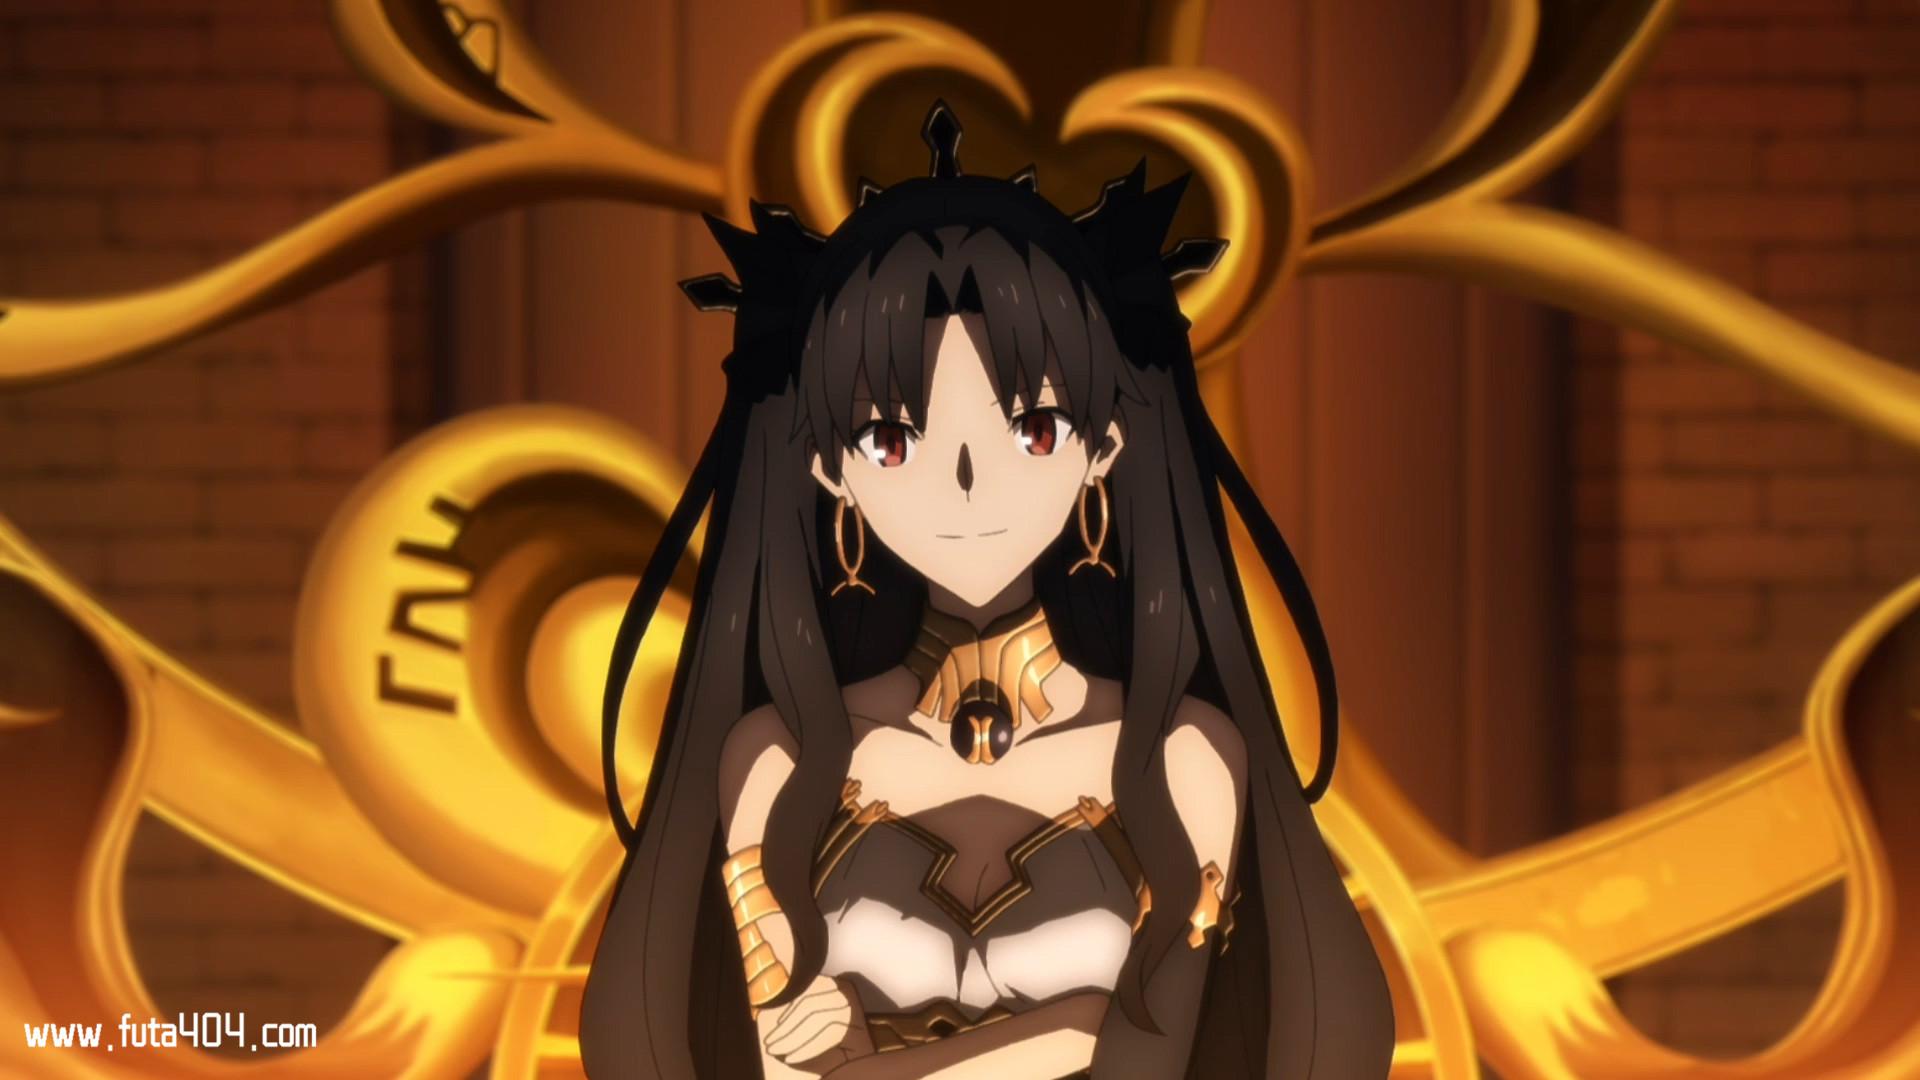 Fate Grand Order 绝对魔兽战线巴比伦尼亚 第9话 Fate Grand Order 动画在线 第1张